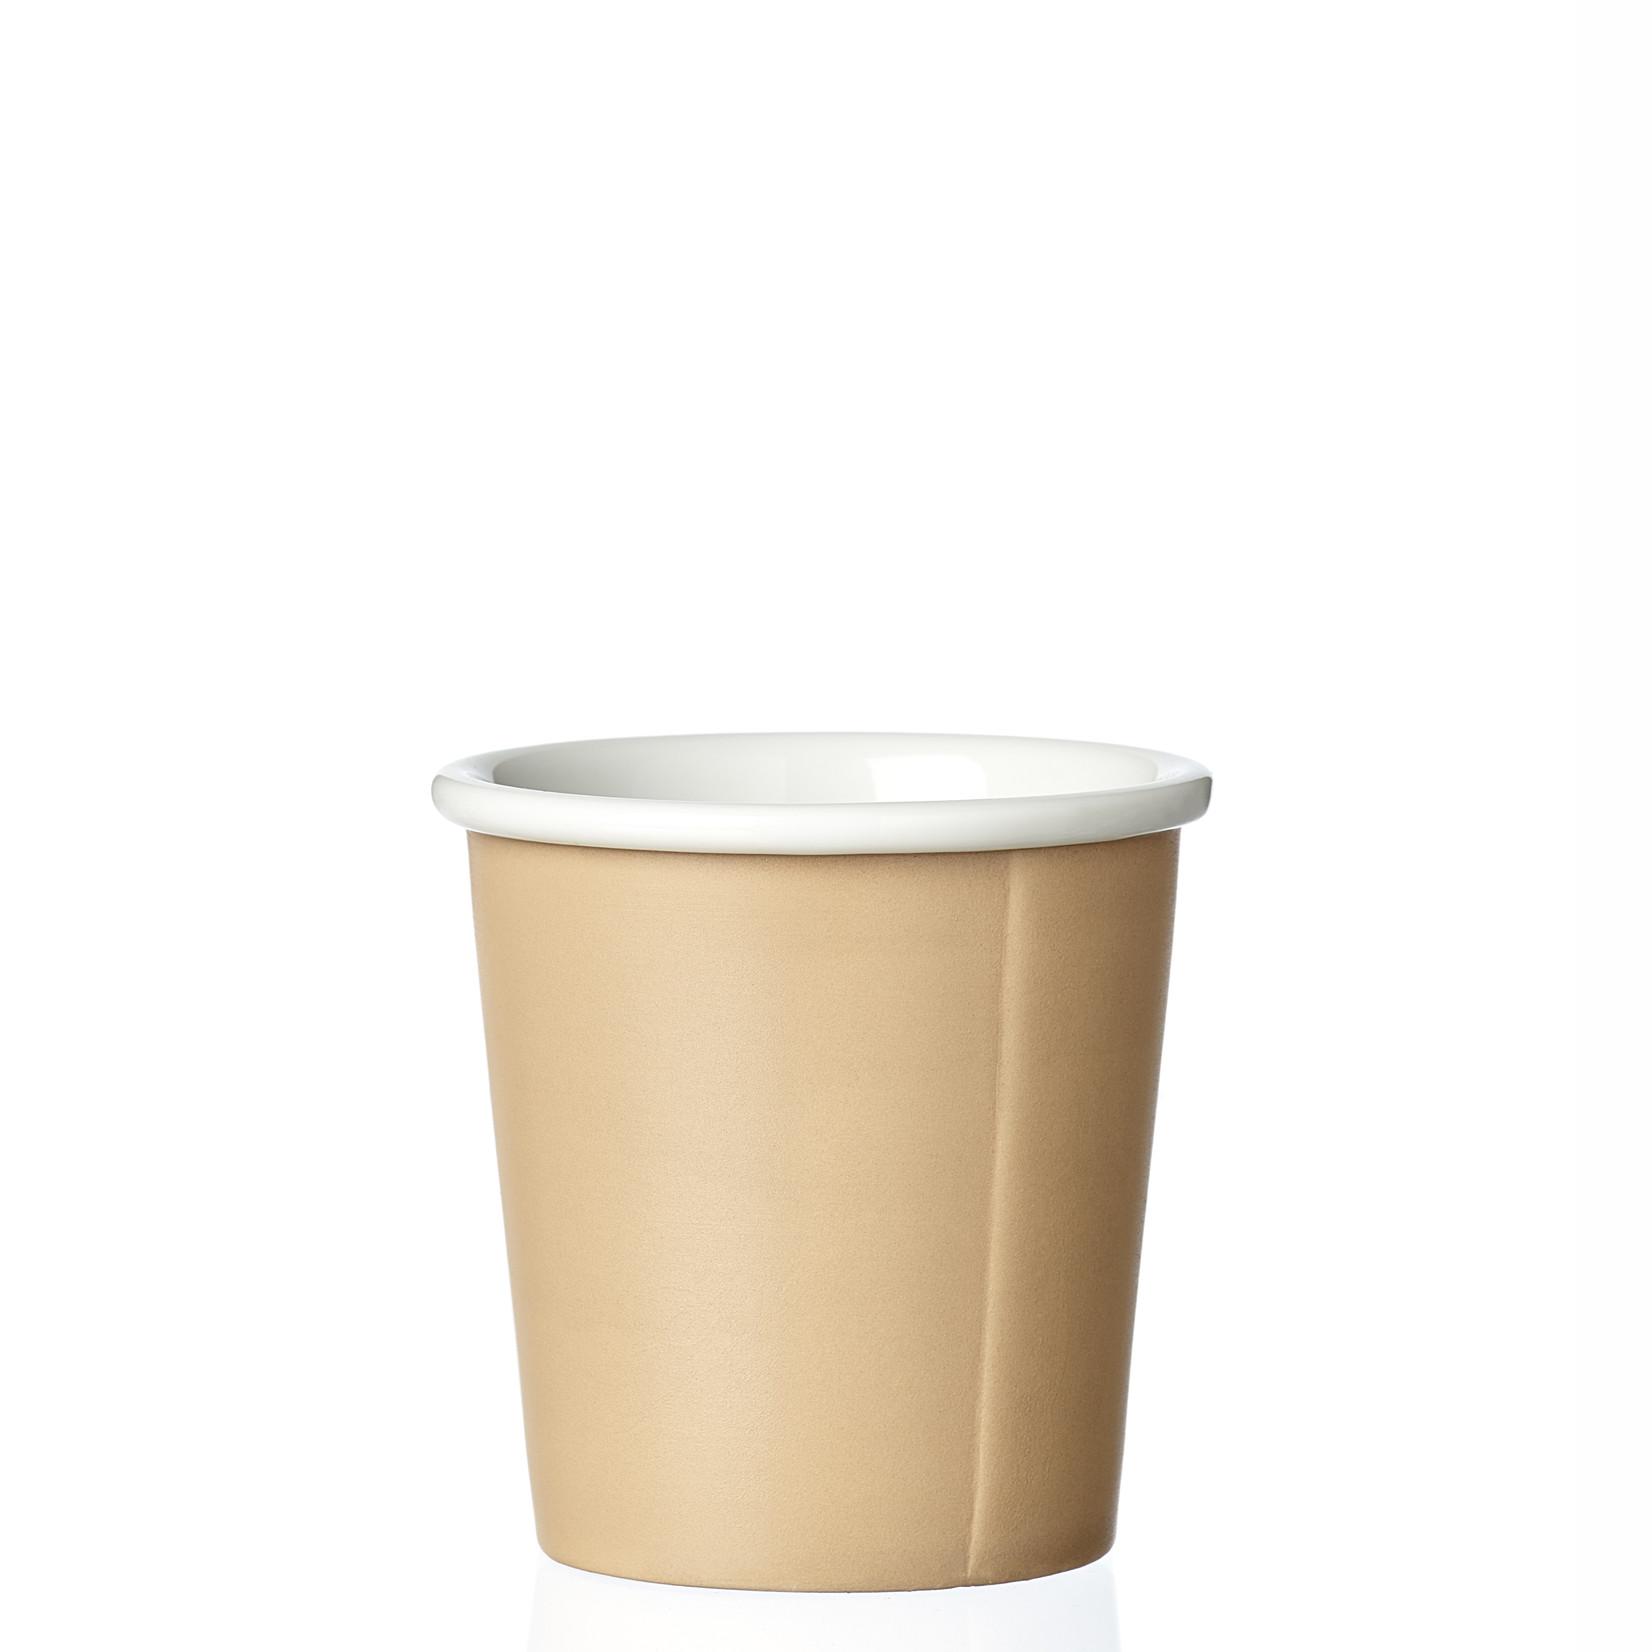 Viva VIVA Scandinavia - Anna espresso cup - 80ml